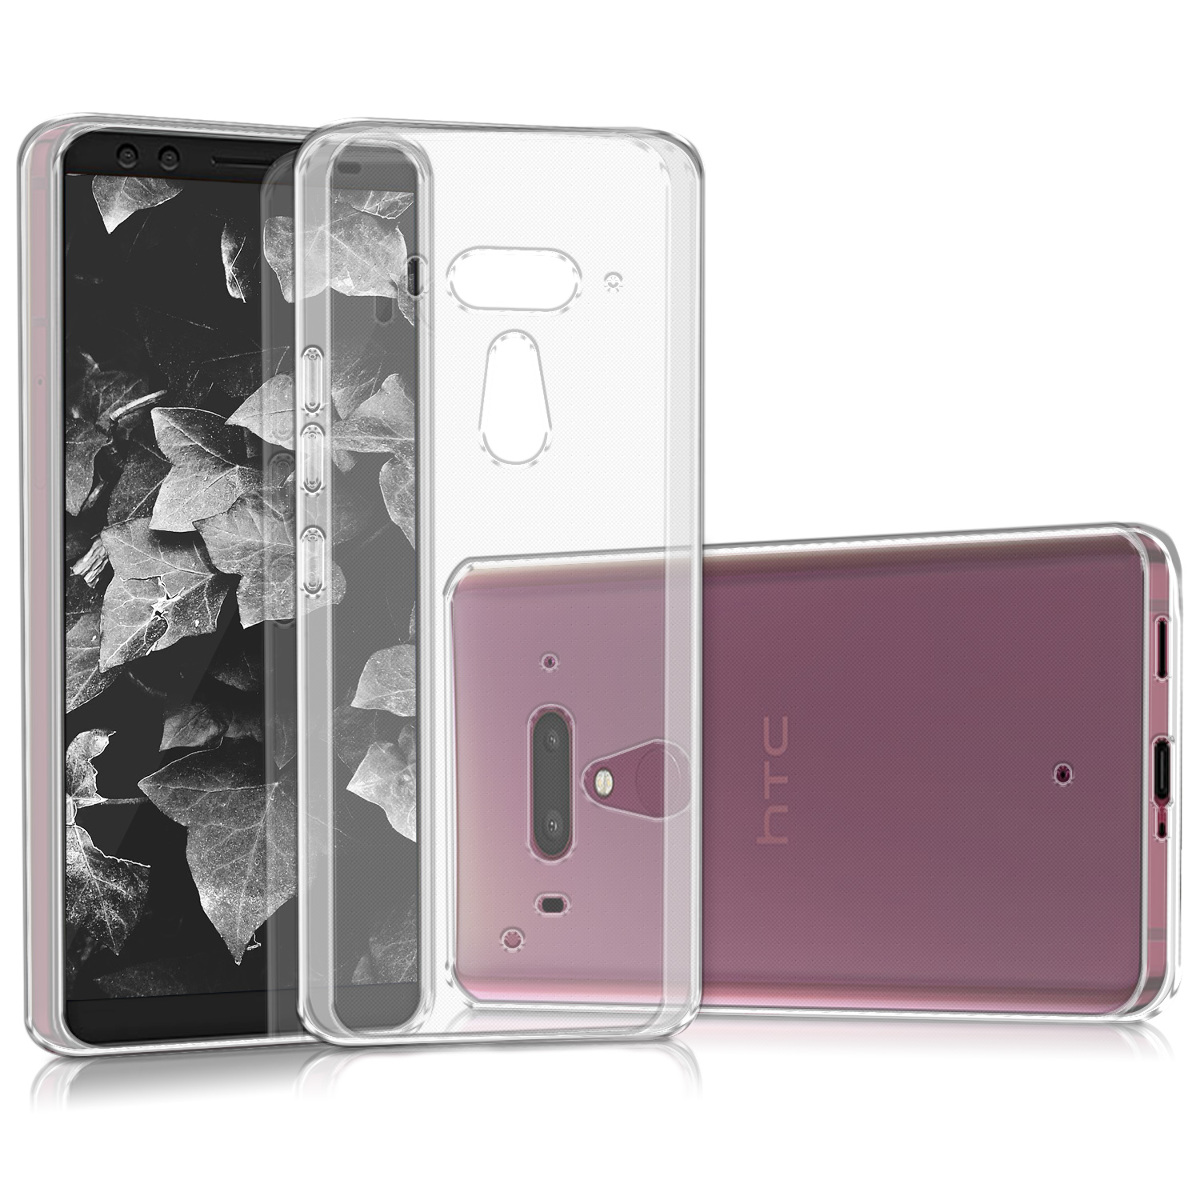 KW Θήκη Σιλικόνης HTC U12+ - Transparent (44930.03)